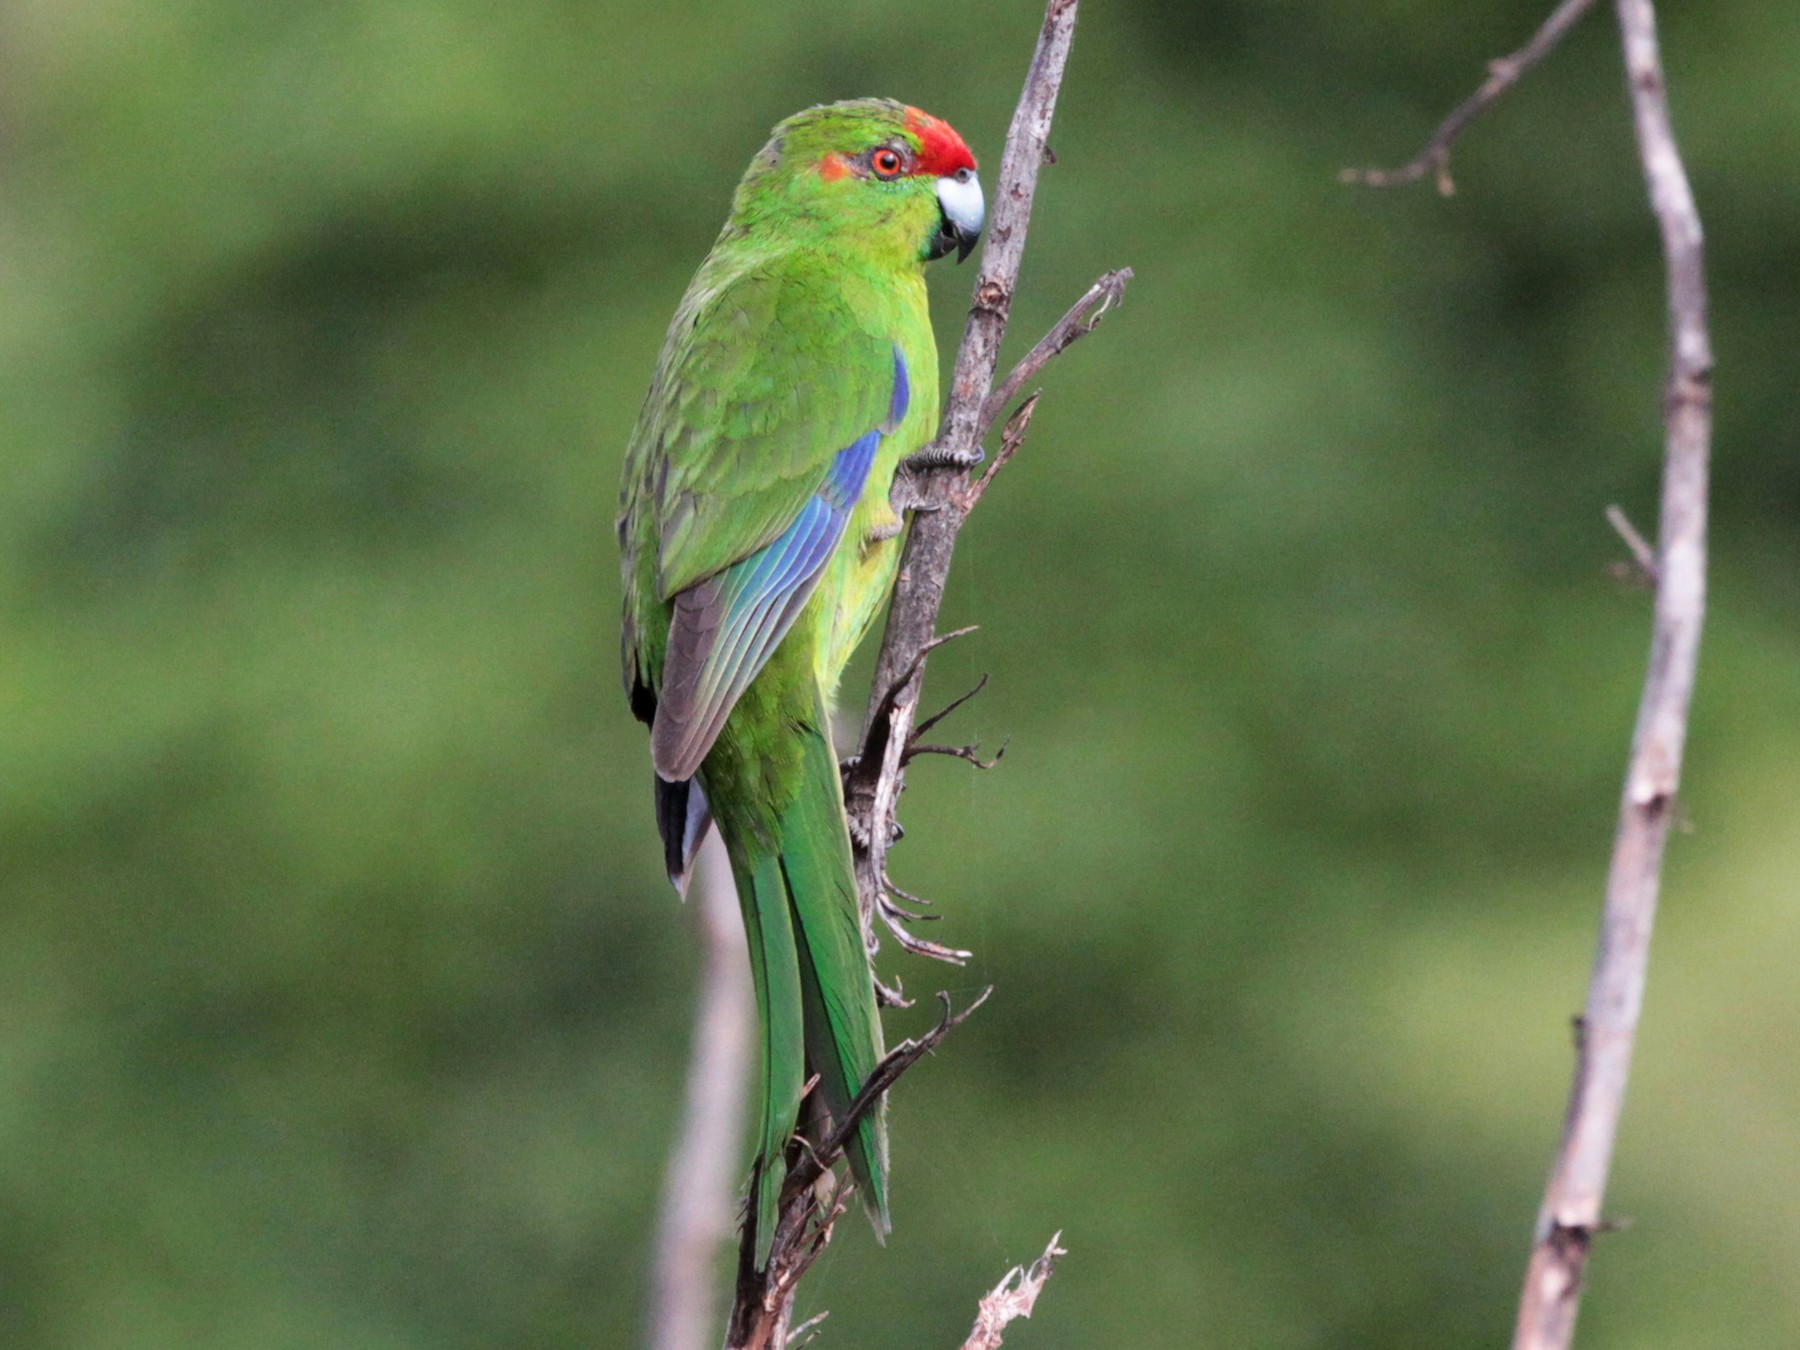 Red-crowned Parakeet - Corey Callaghan